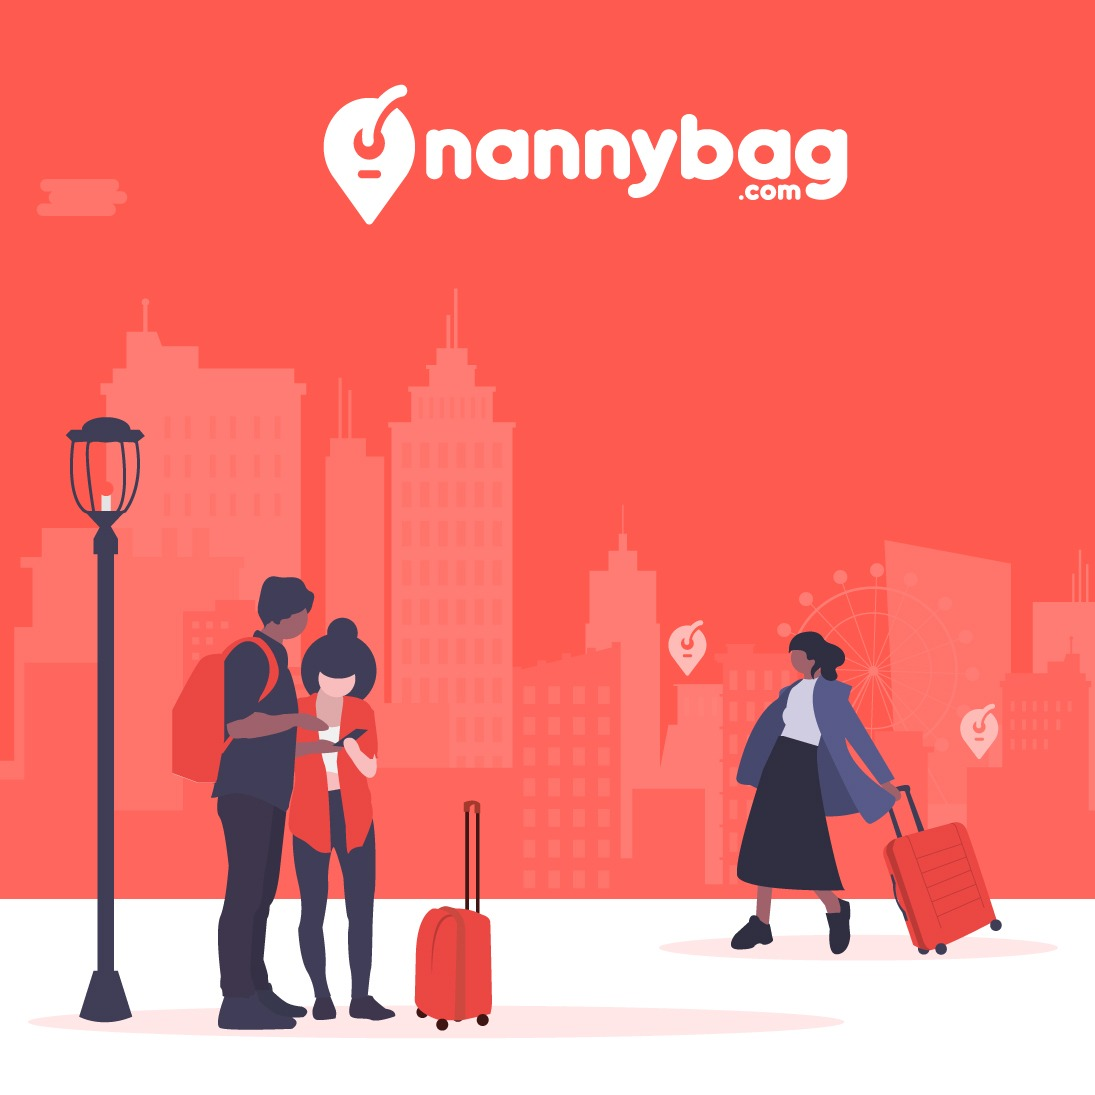 Nannybag